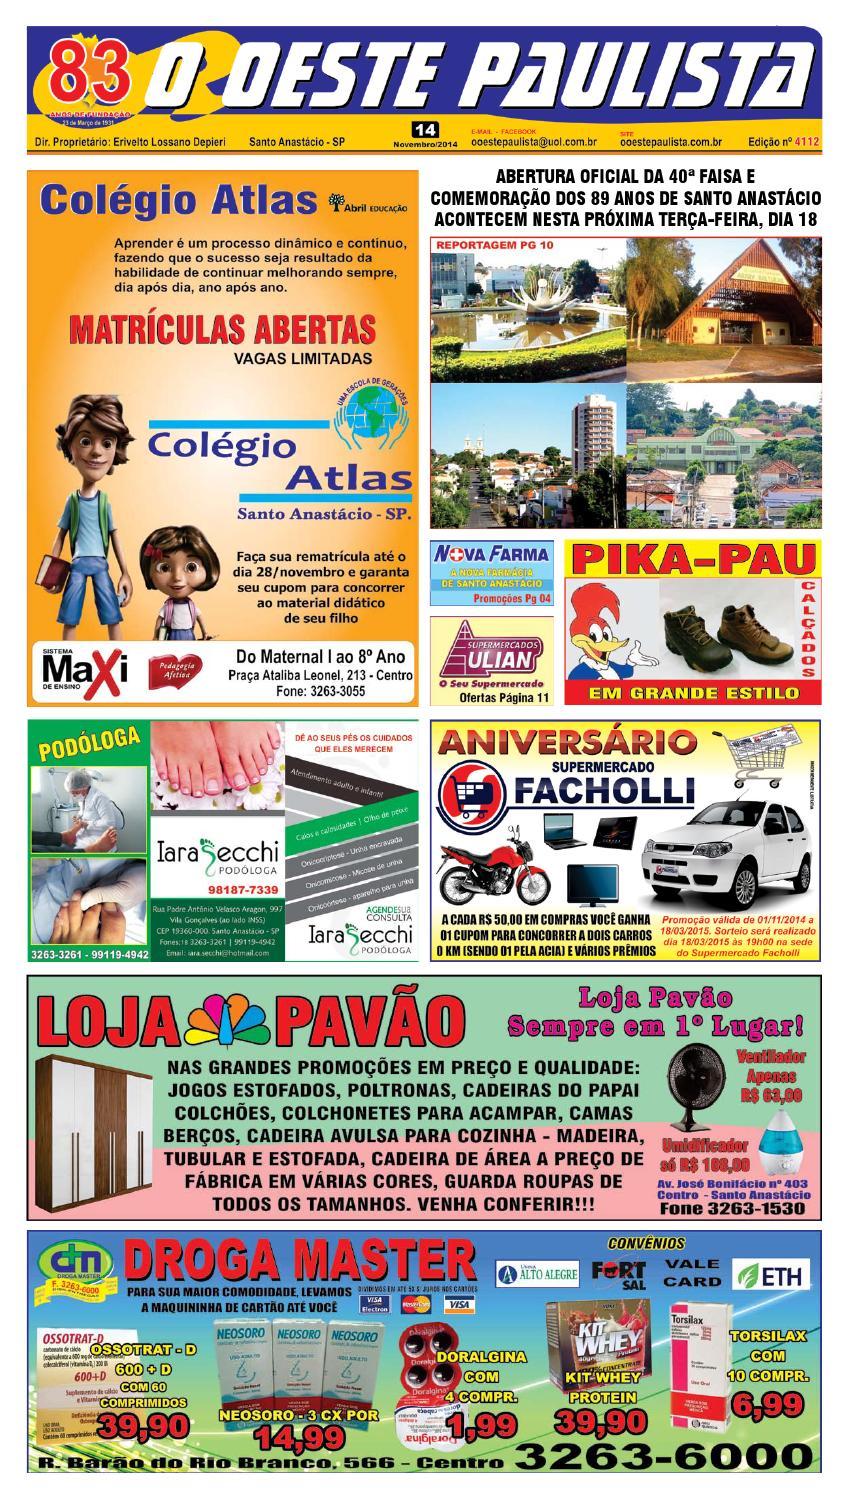 Jornaloestepta 2014 11 14 nº 4112 by José Carlos Ramires - issuu 0bbb958e0a